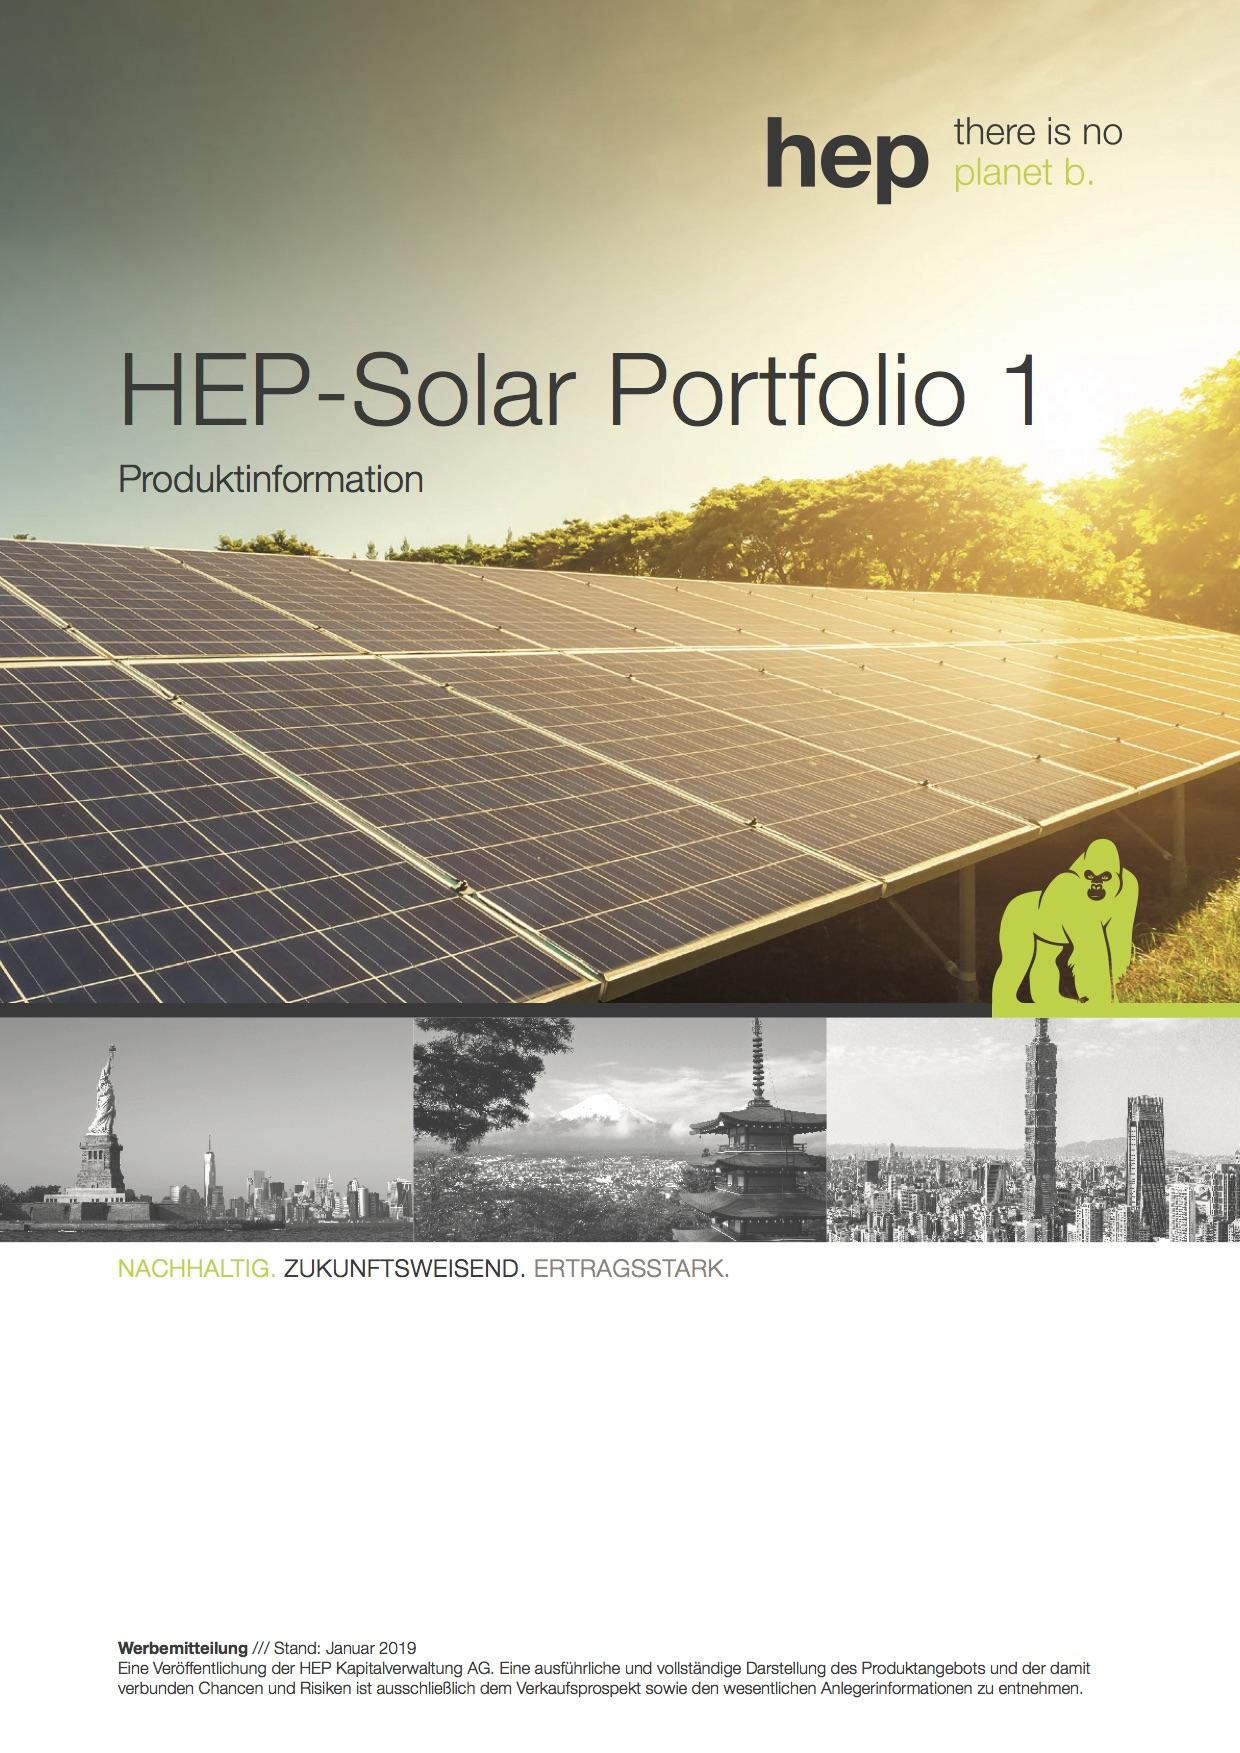 HEP Solar Portfolio 1